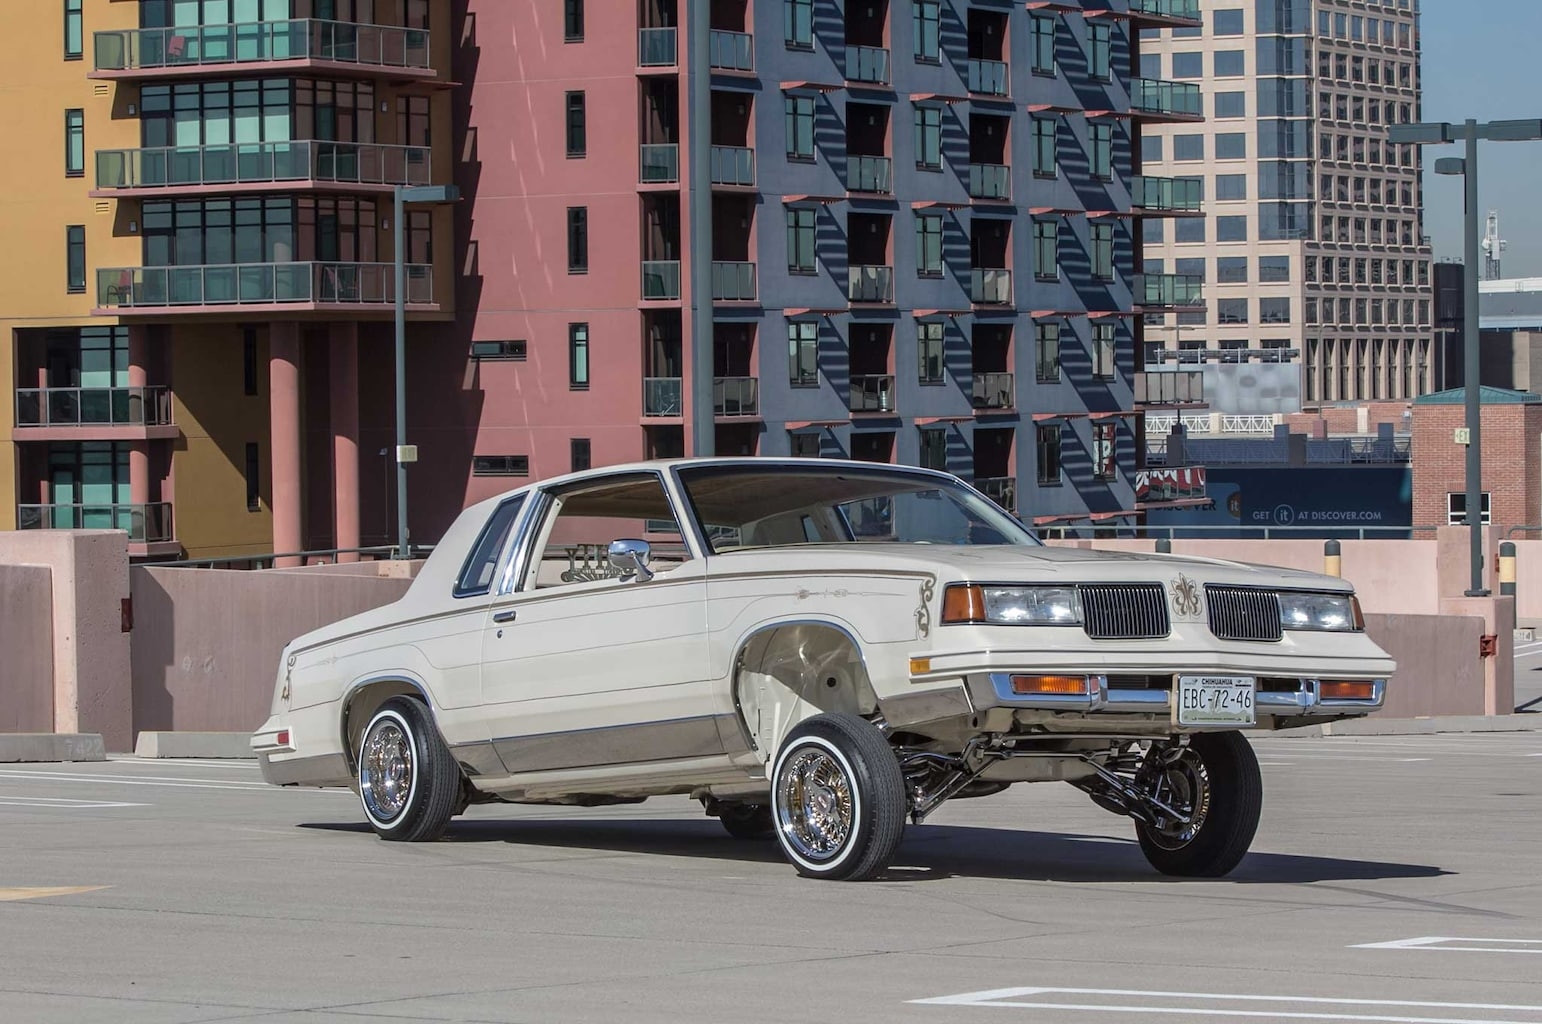 1985 oldsmobile cutlass supreme passenger side front view 007